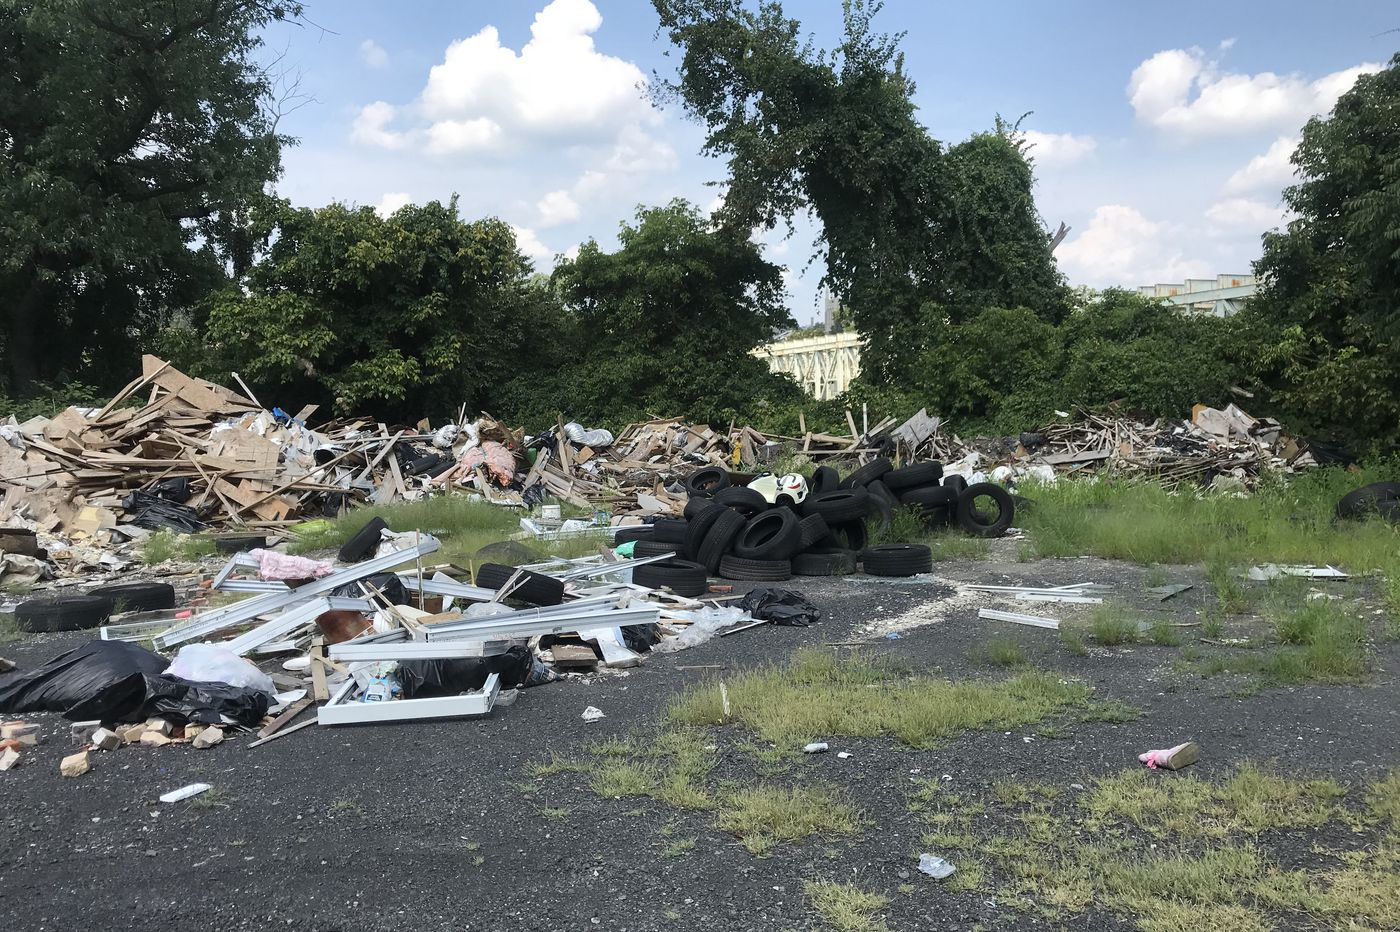 'Eye-popping' 245-ton illegal dump cleared near Philadelphia drinking water intakes